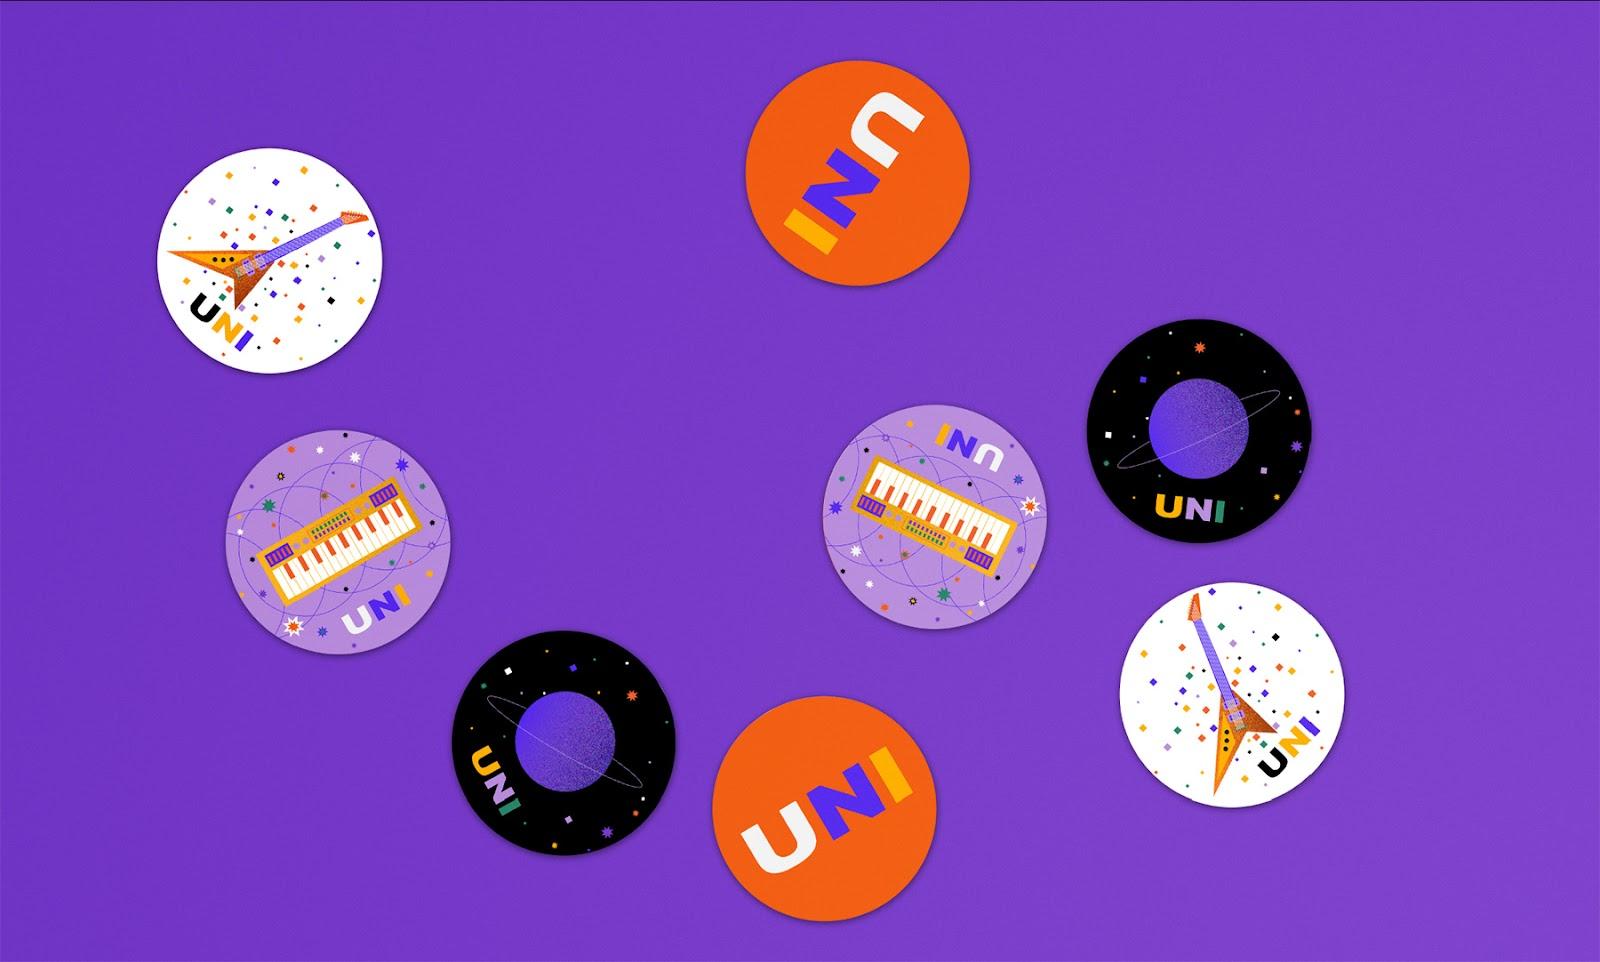 uni-music-school-sticker